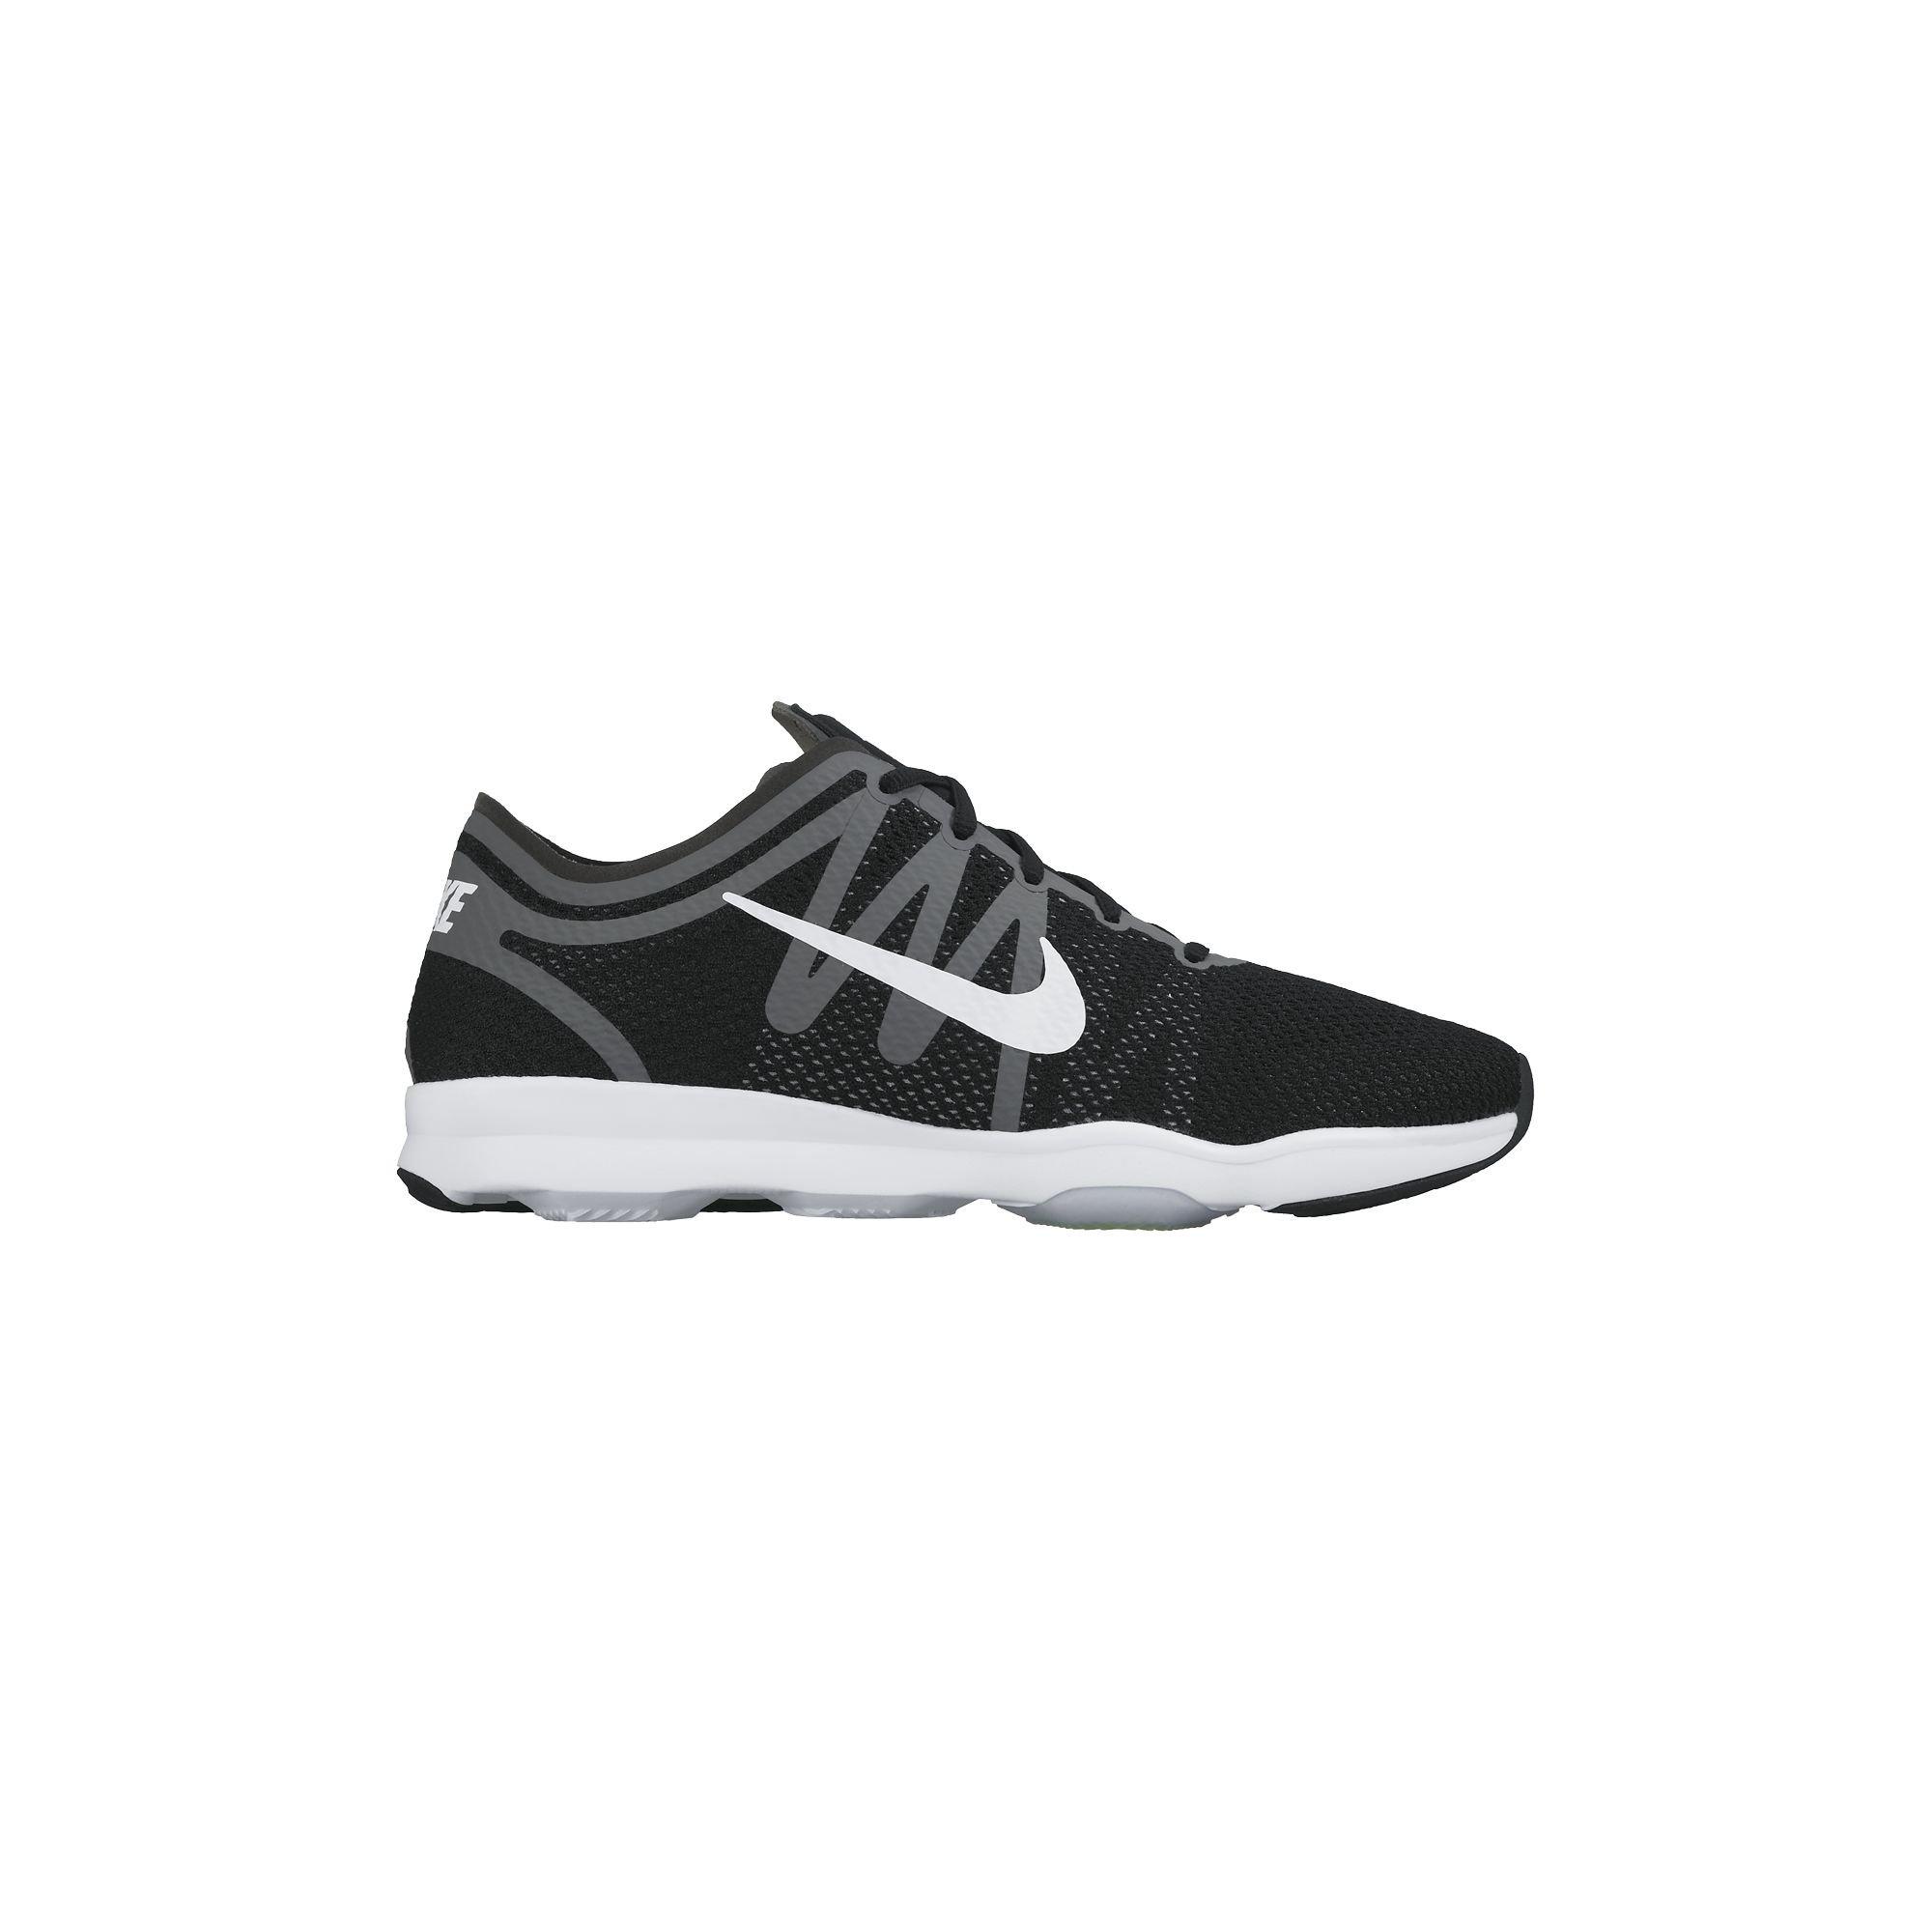 Women's Nike Air Zoom Fit 2 Training Shoe Black/Grey/White Size 9.5 M US